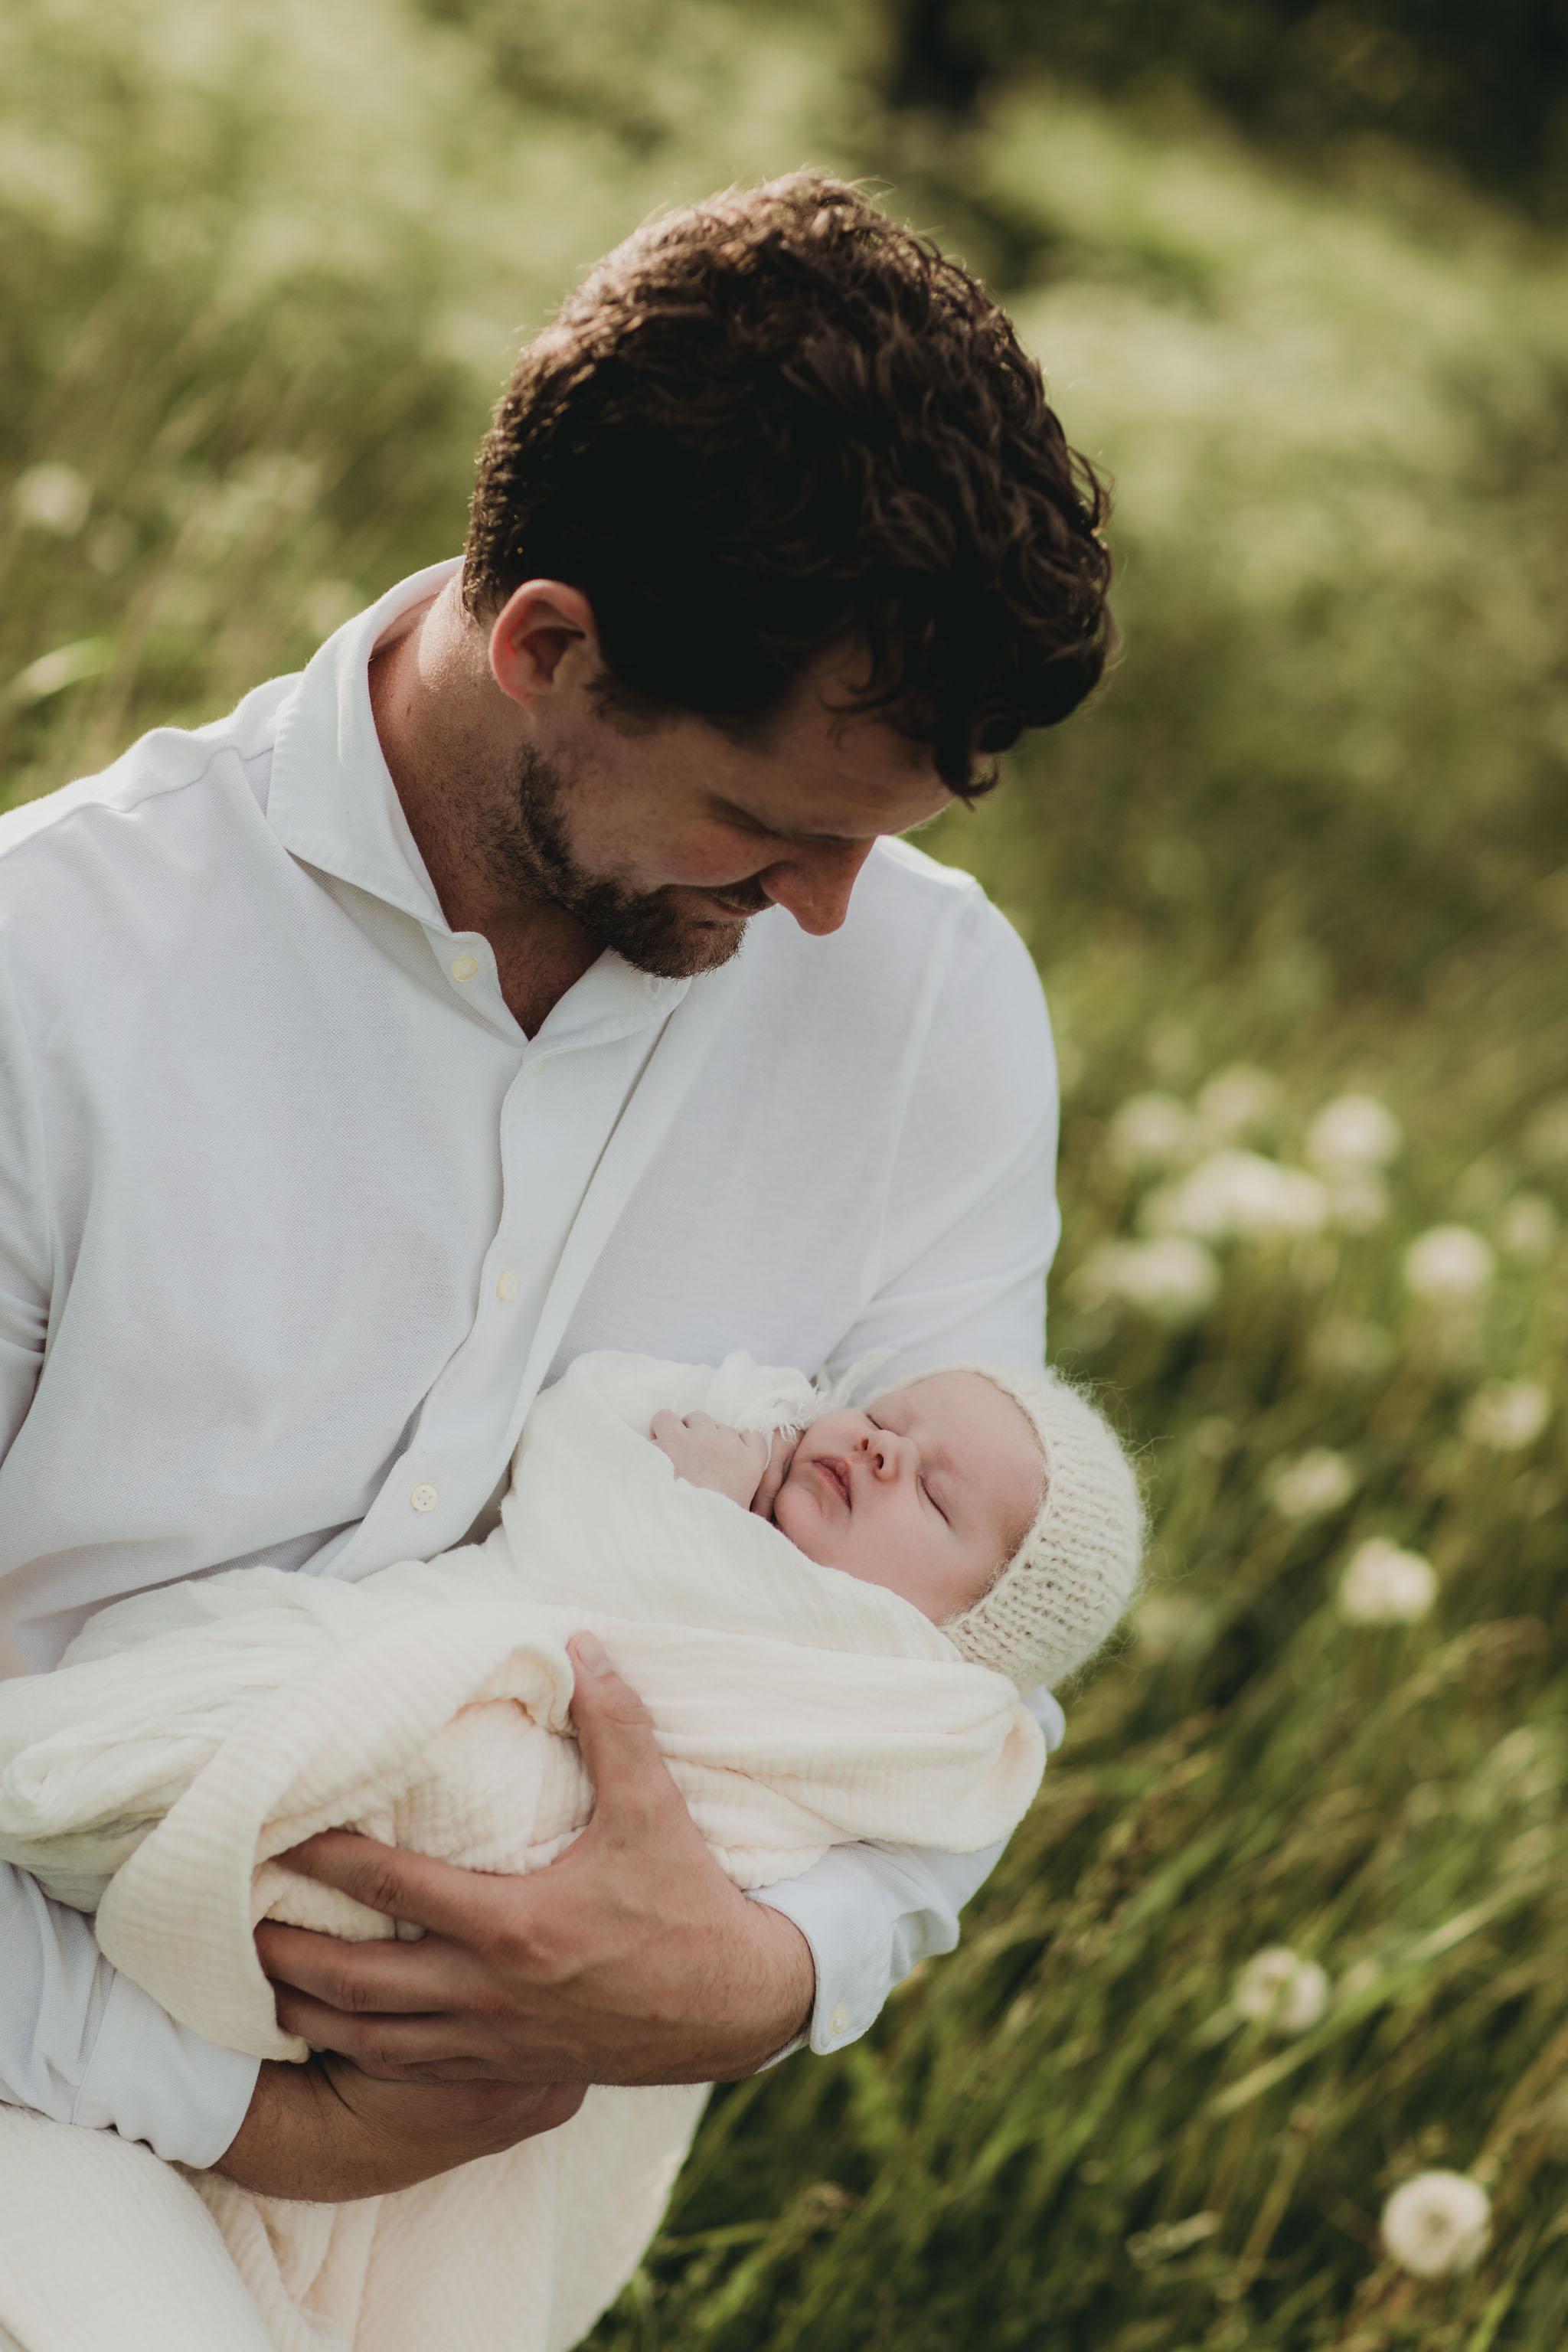 Nyfødtfotografering - Familie - Fotograf Ida Hvattum